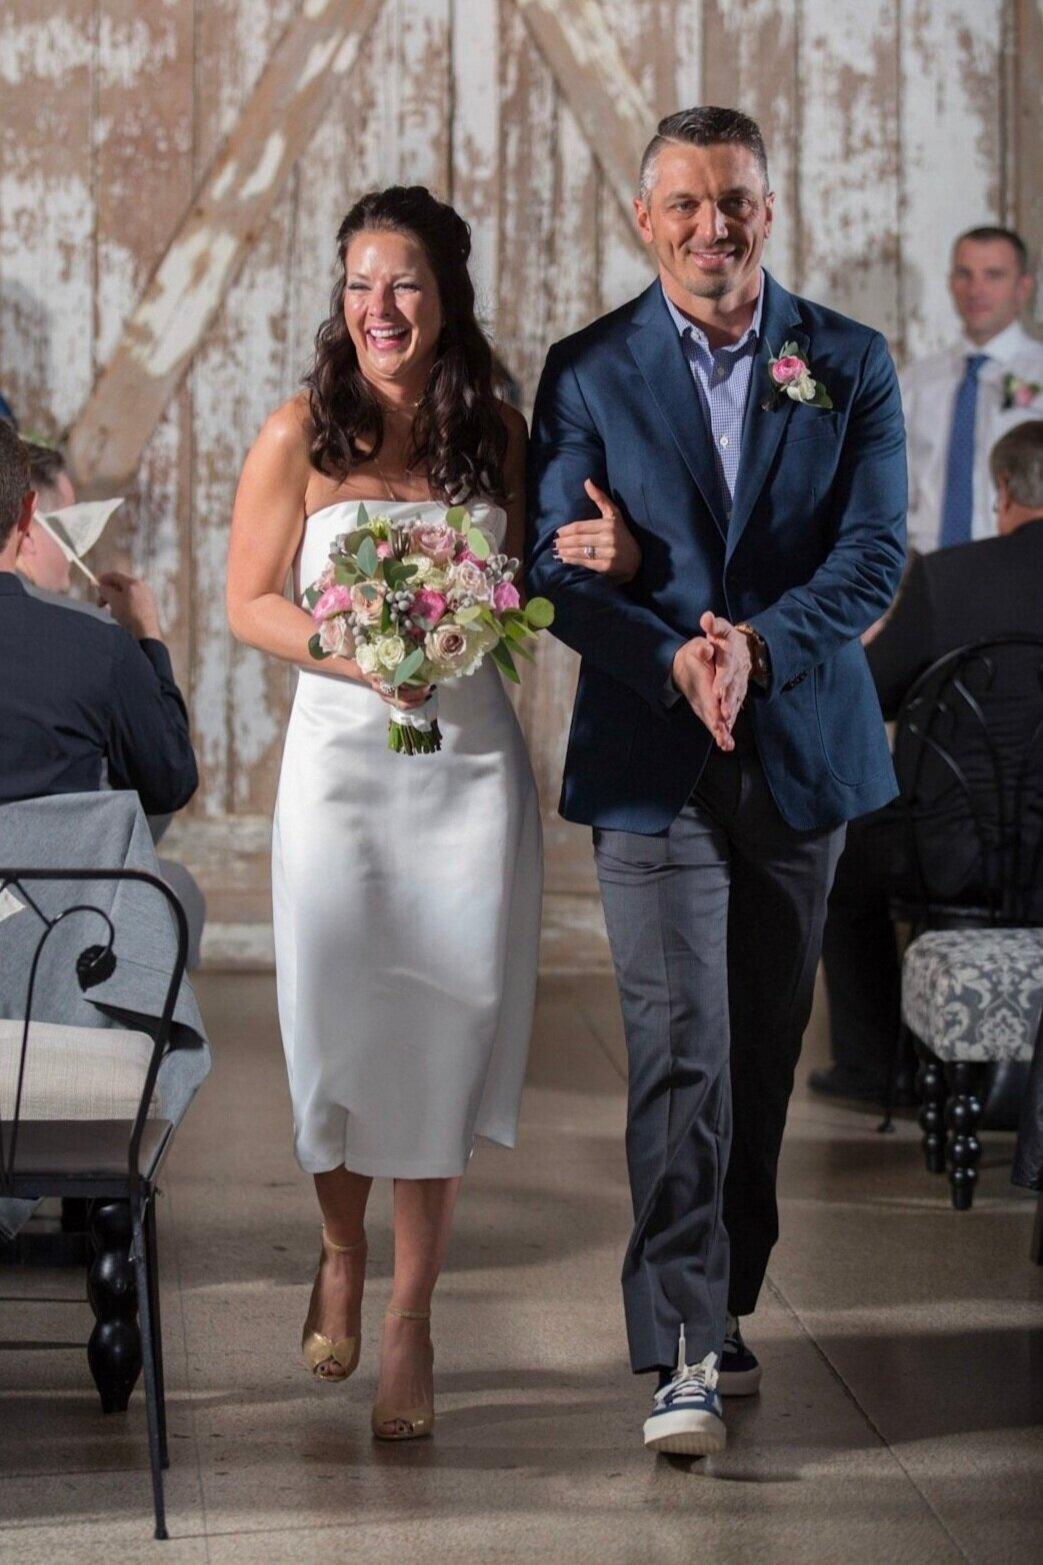 Merried Wedding Blog Wedding Inspiration Kansas City